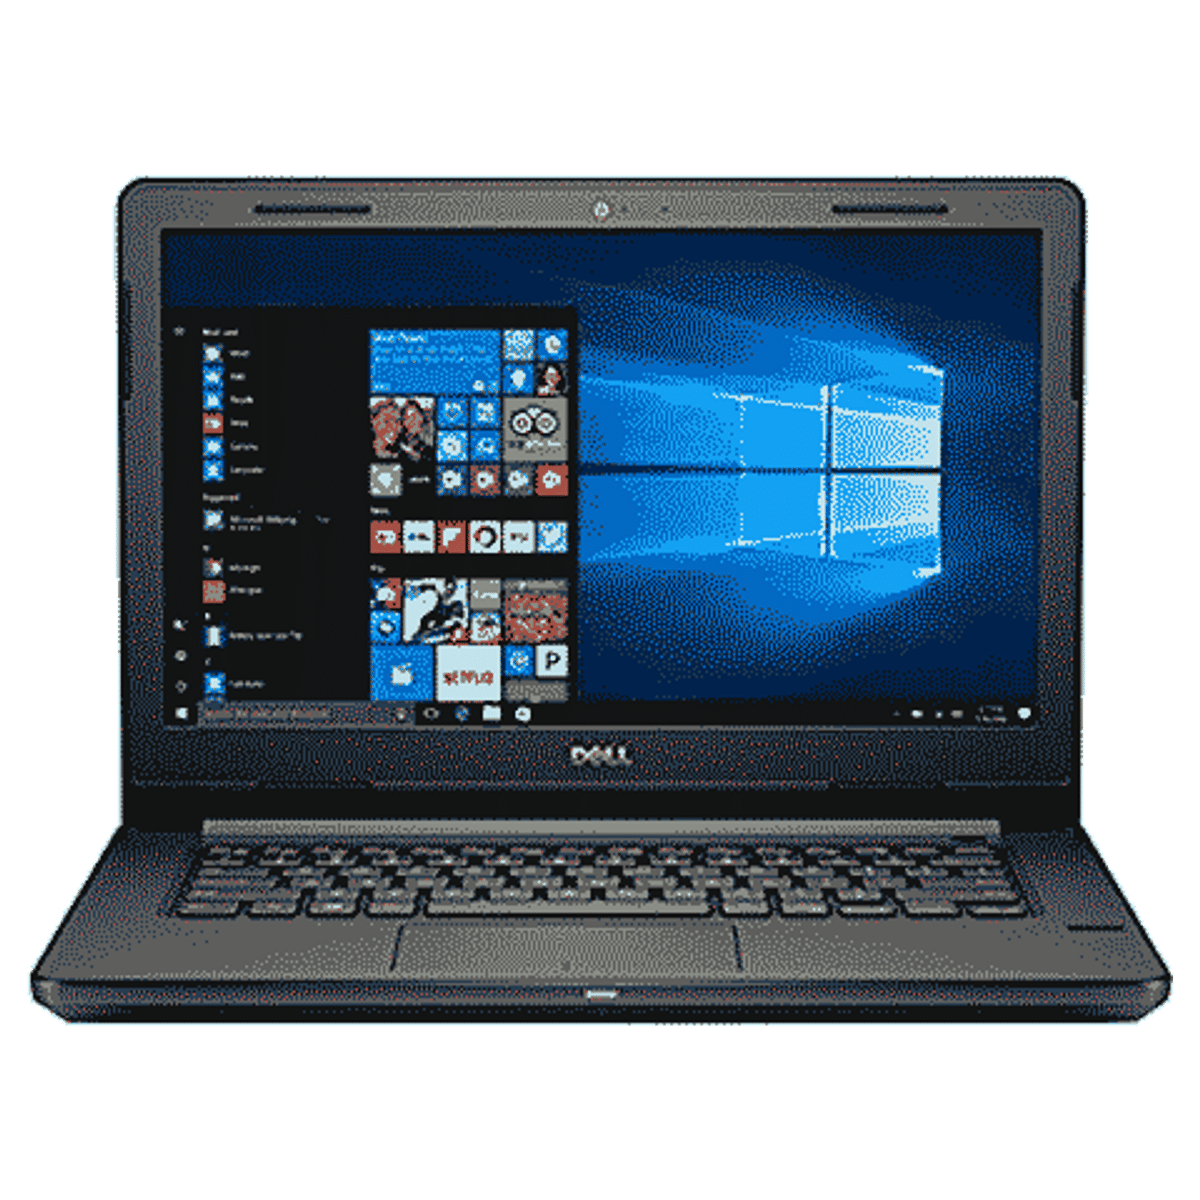 Best Laptop under Rs 30,000 in India September 2019 | Digit in